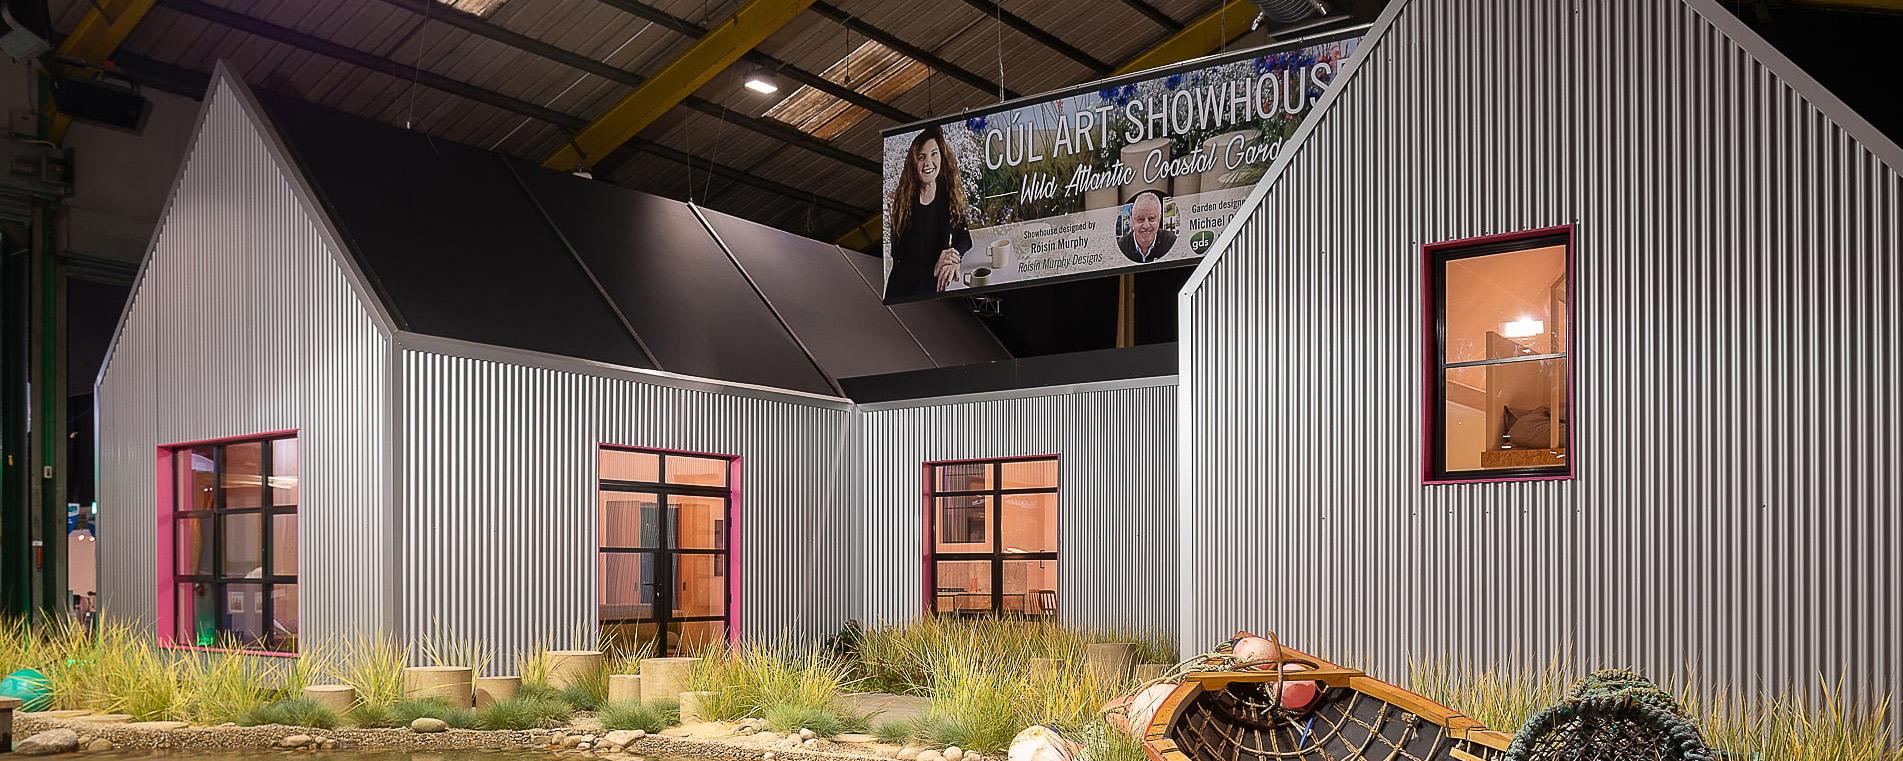 Cul Art Showhouse